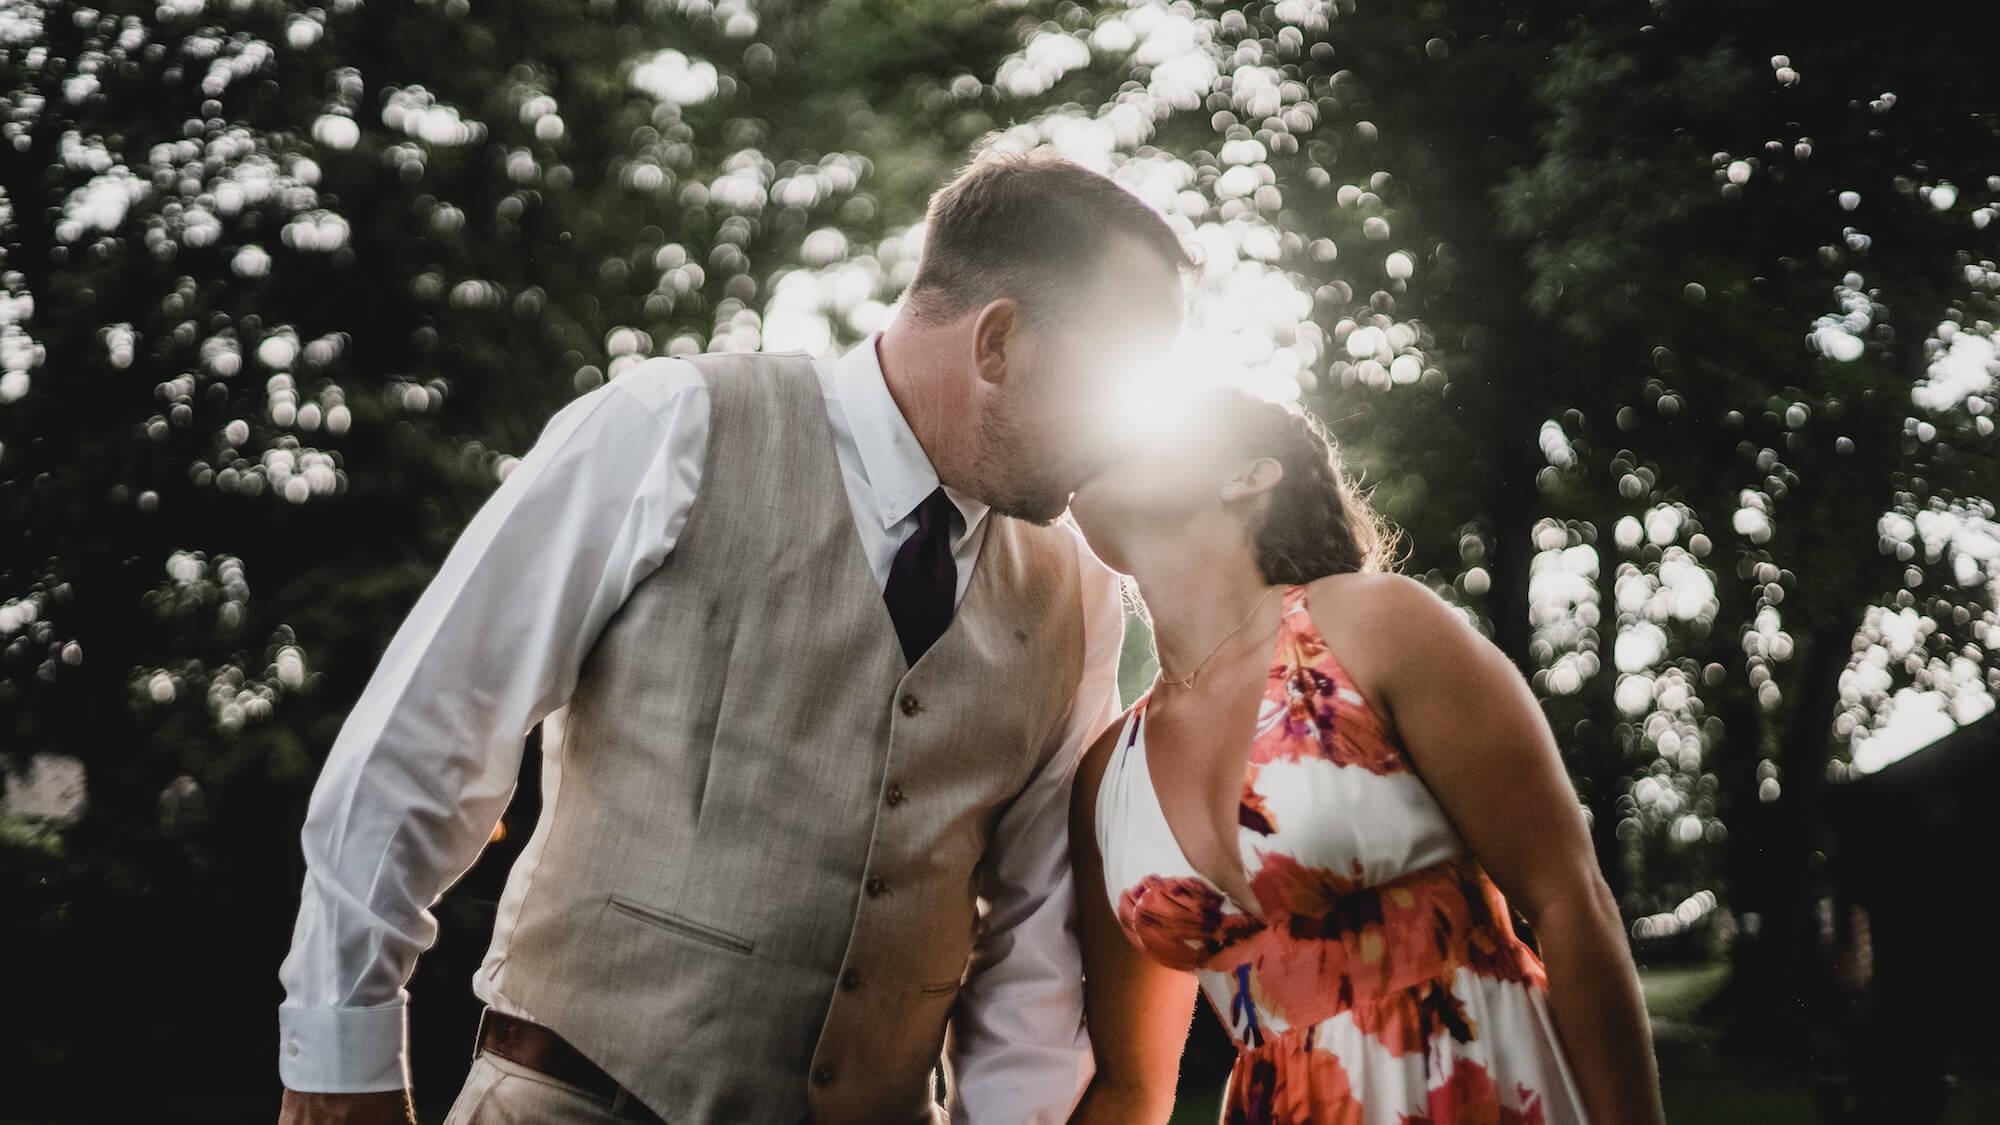 engle-olson-maddy-pat-mn-wedding-photography-41.jpg